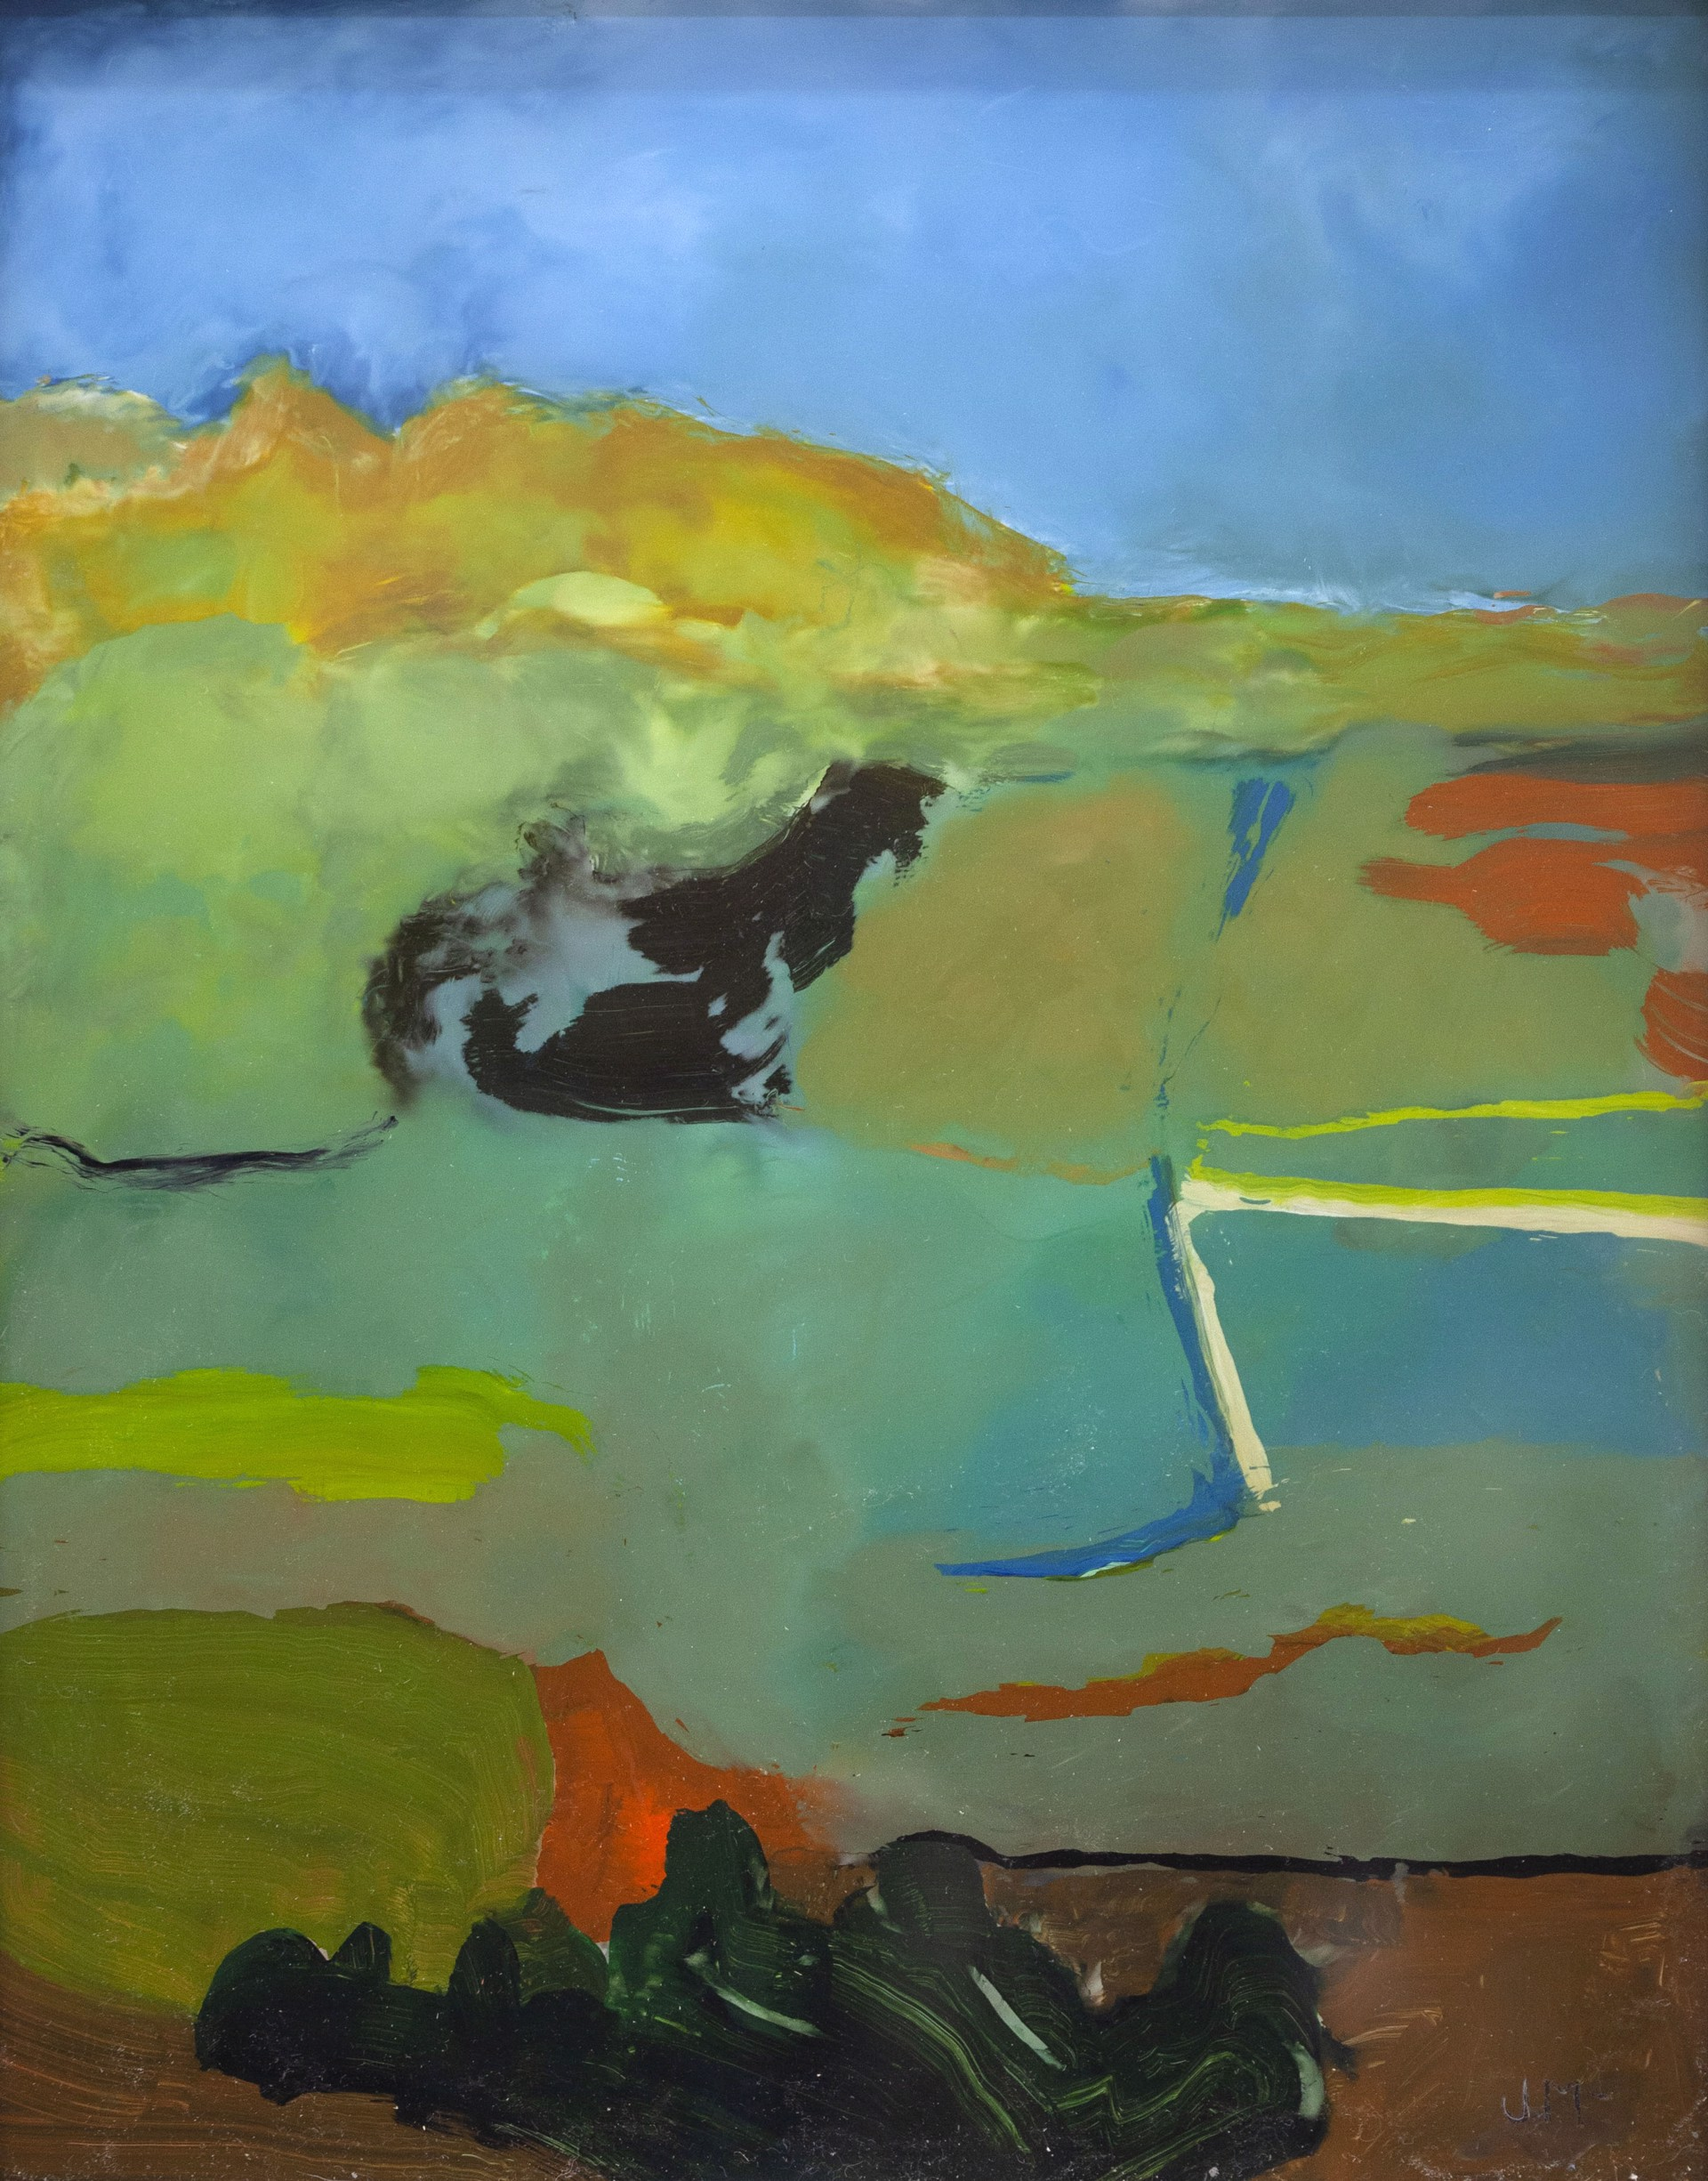 Blue Skies by John McCaw